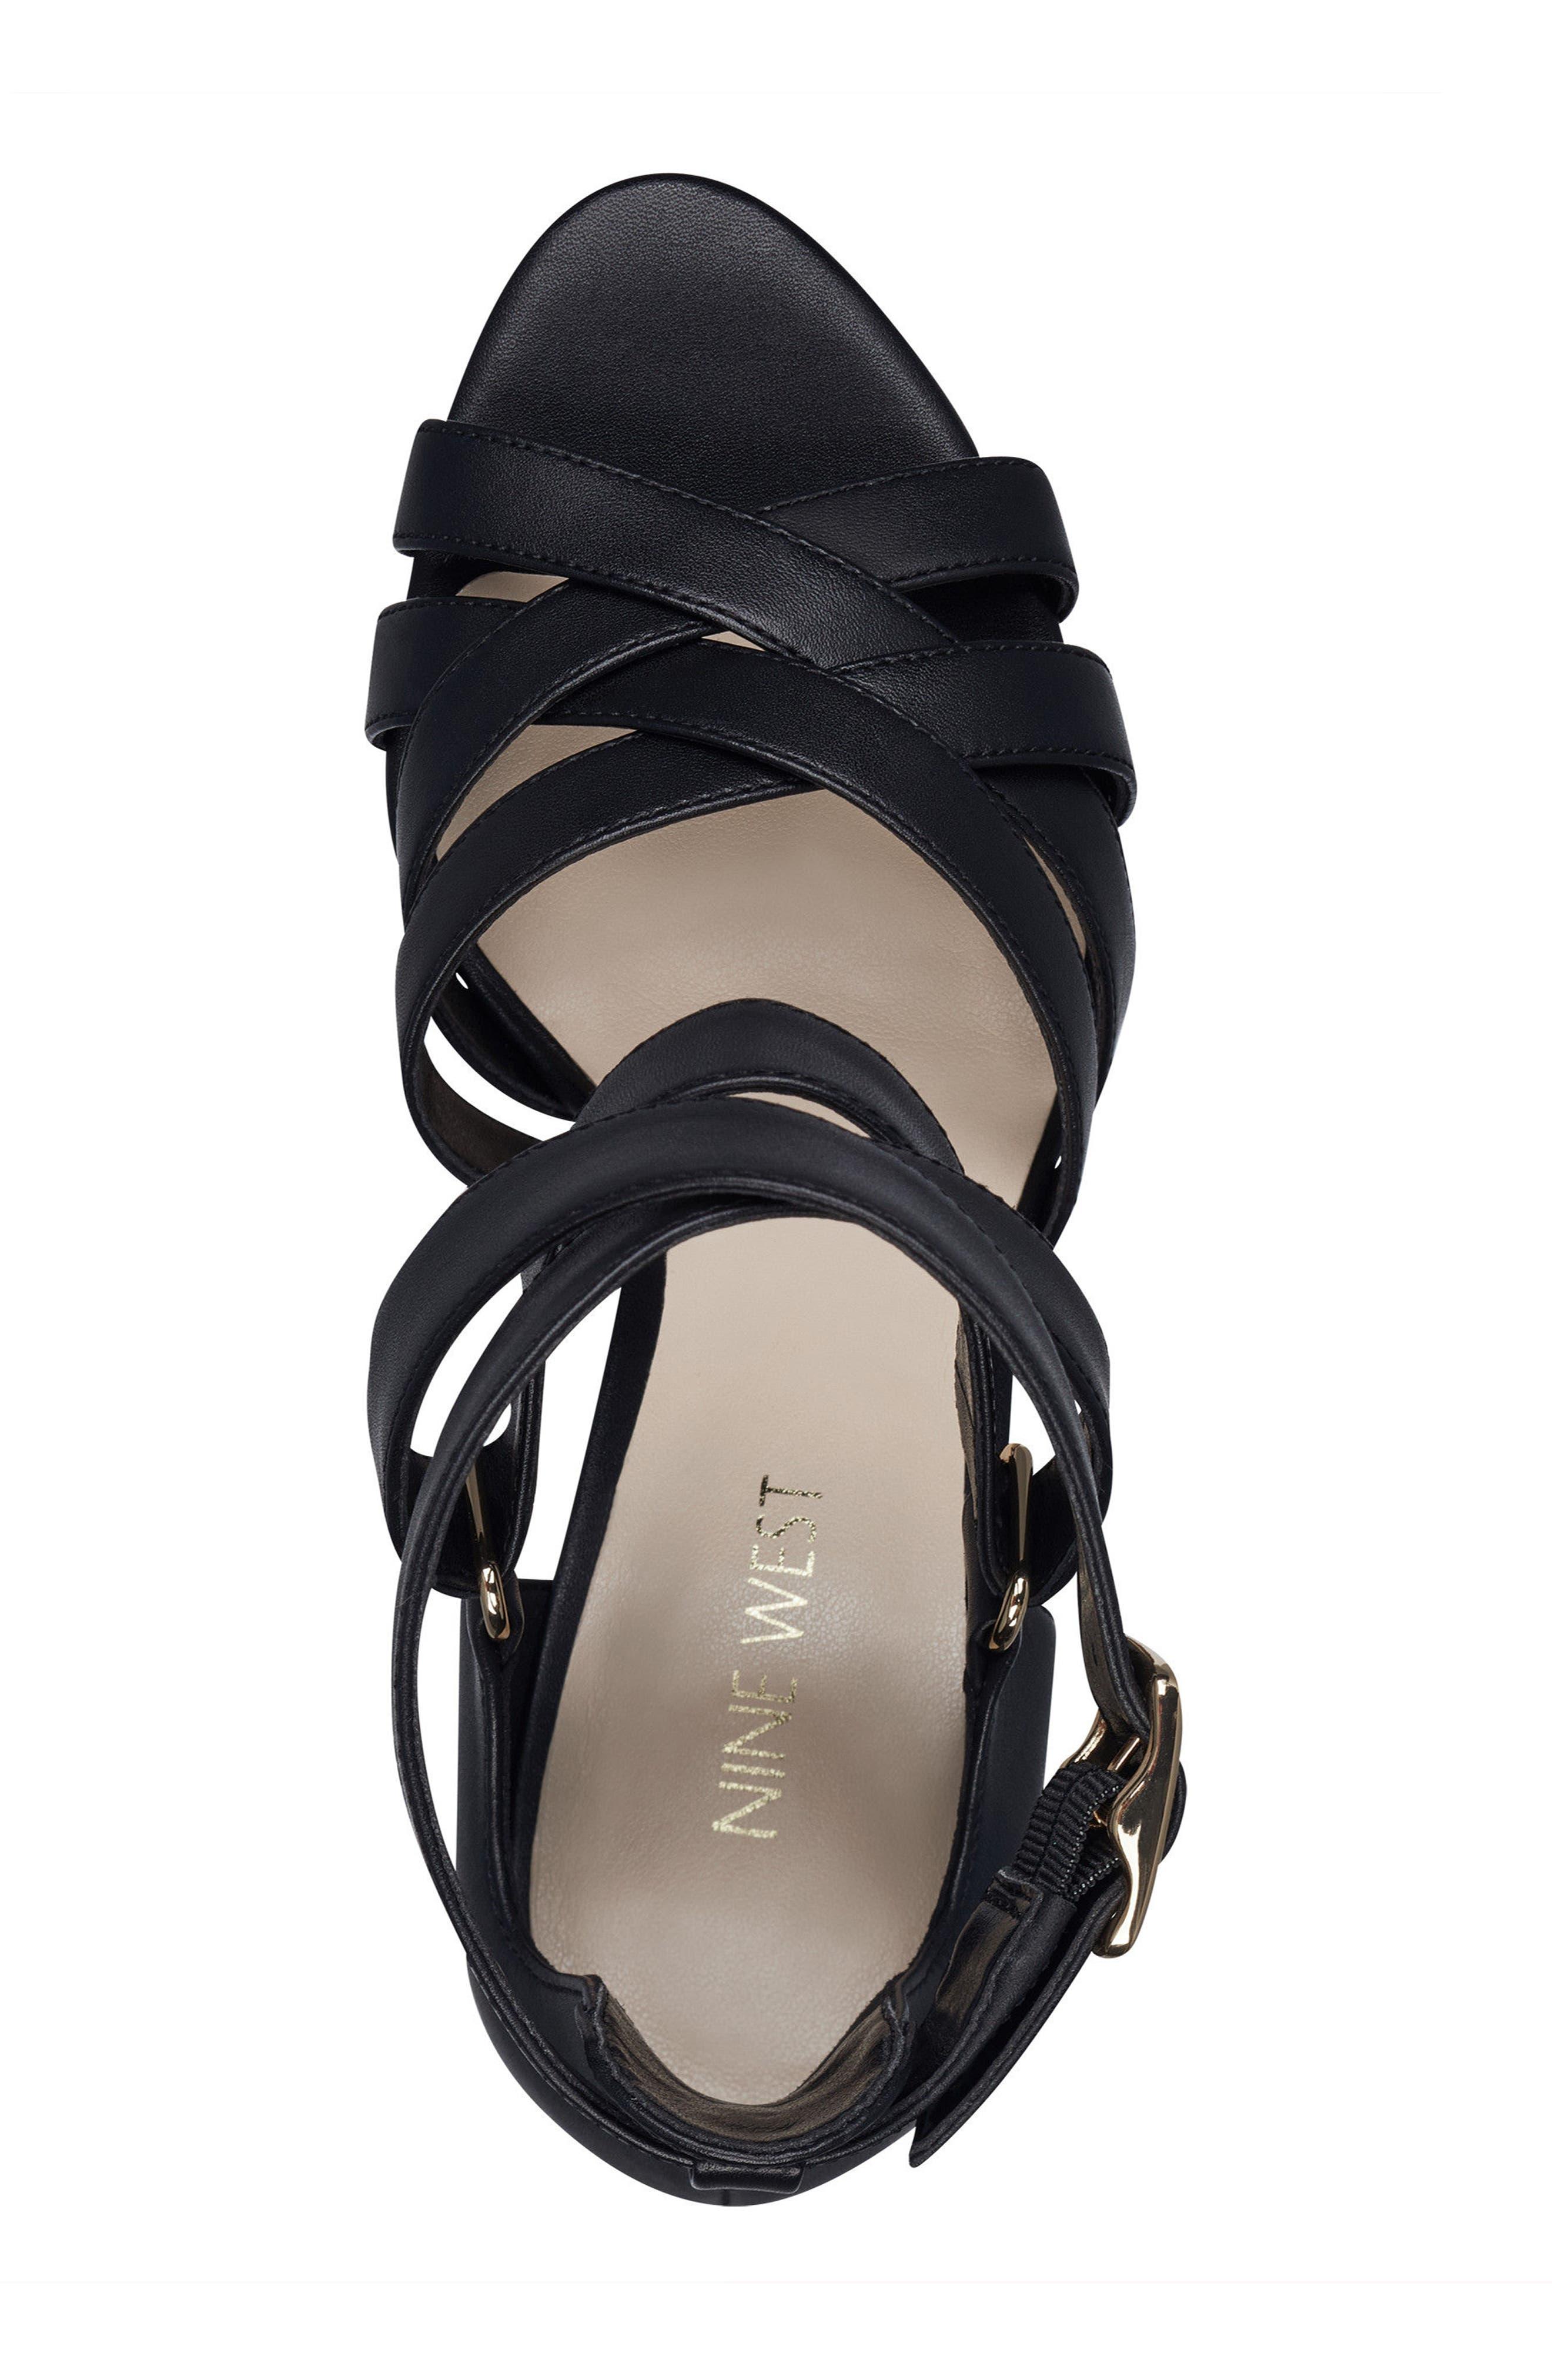 McGlynn Strappy Sandal,                             Alternate thumbnail 5, color,                             Black Leather